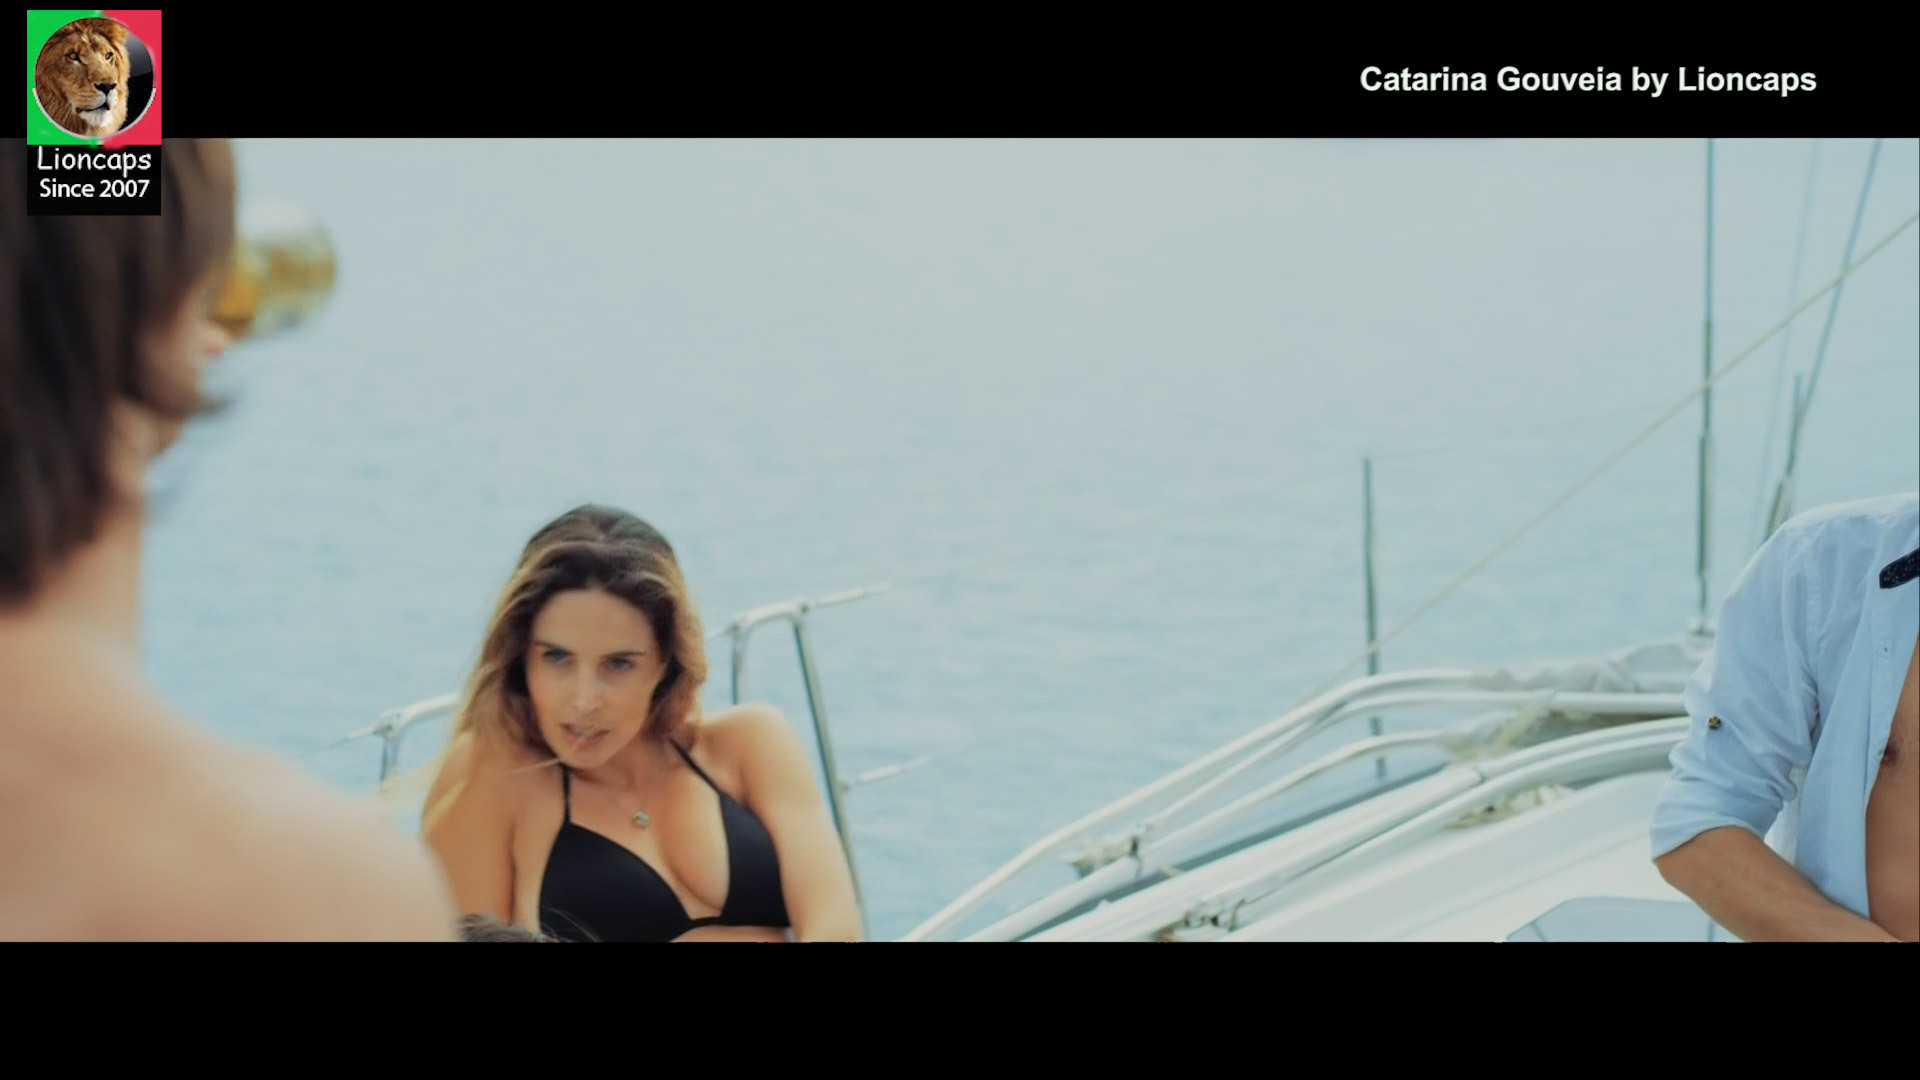 catarina_gouveia_perdidos_lioncaps_09_05_2021_07 (4).jpg